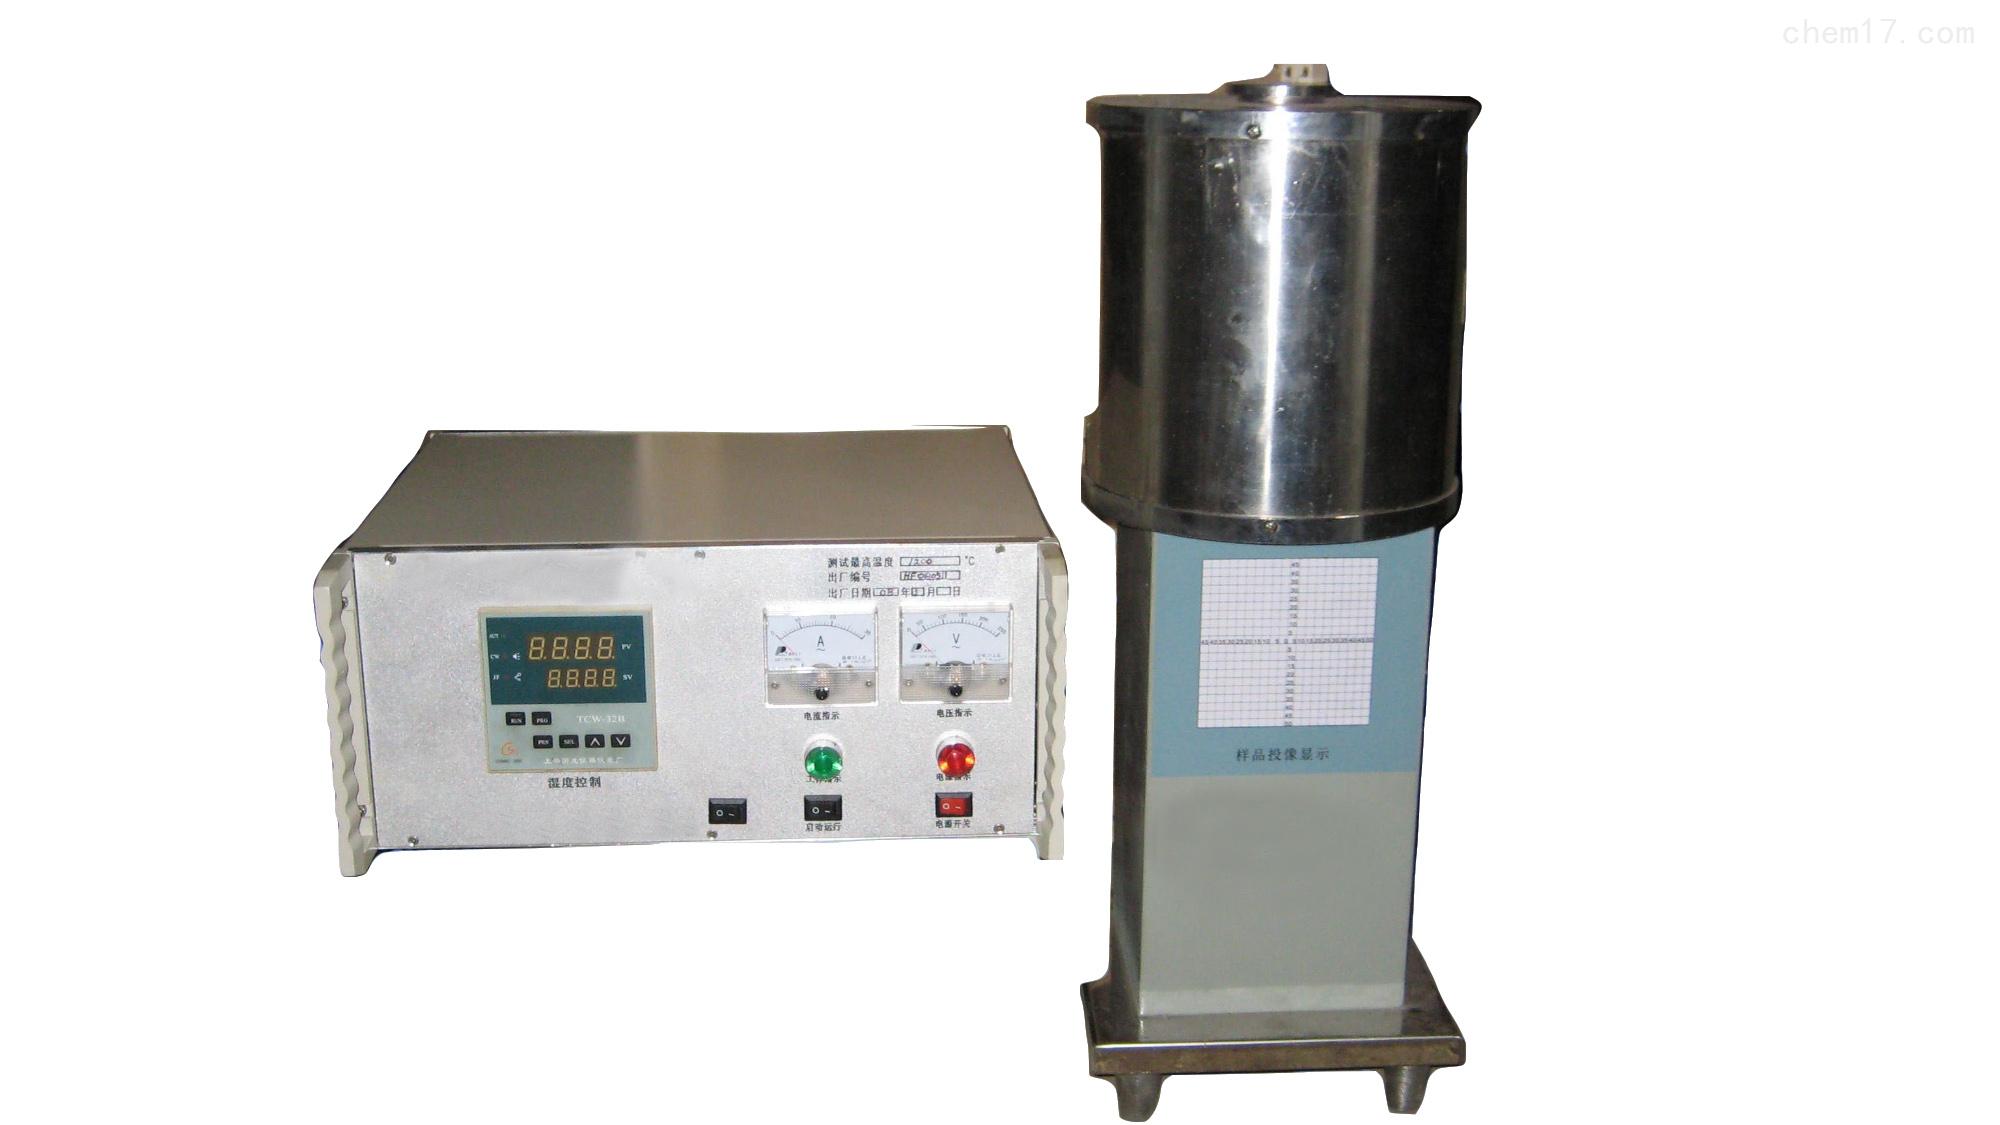 JH-Ⅳ-10玻璃表面张力测定仪(缩丝法)